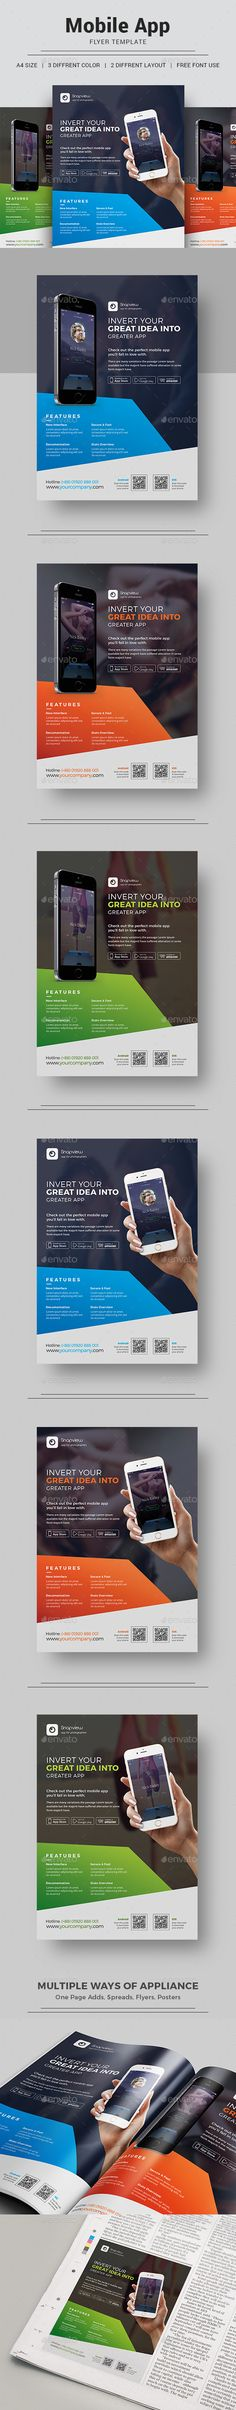 App Promotion Flyer Template PSD. Download here: https://graphicriver.net/item/app-promotion-flyer/17408425?ref=ksioks